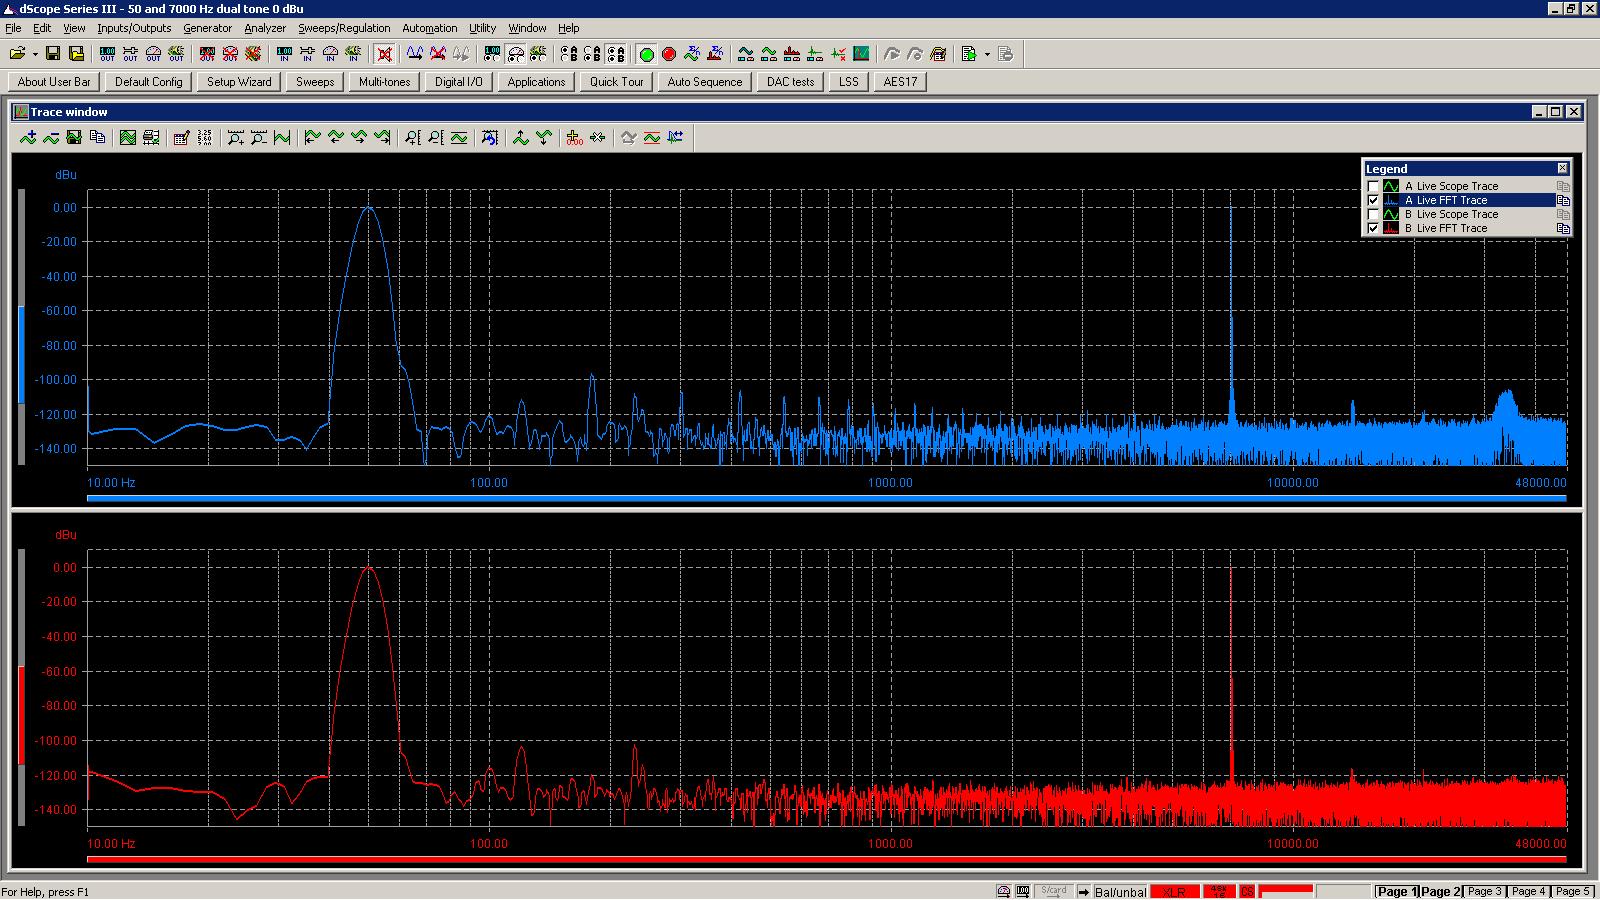 20151214 LiqCarb 50+7000Hz dual tone 0dBu 300R.png